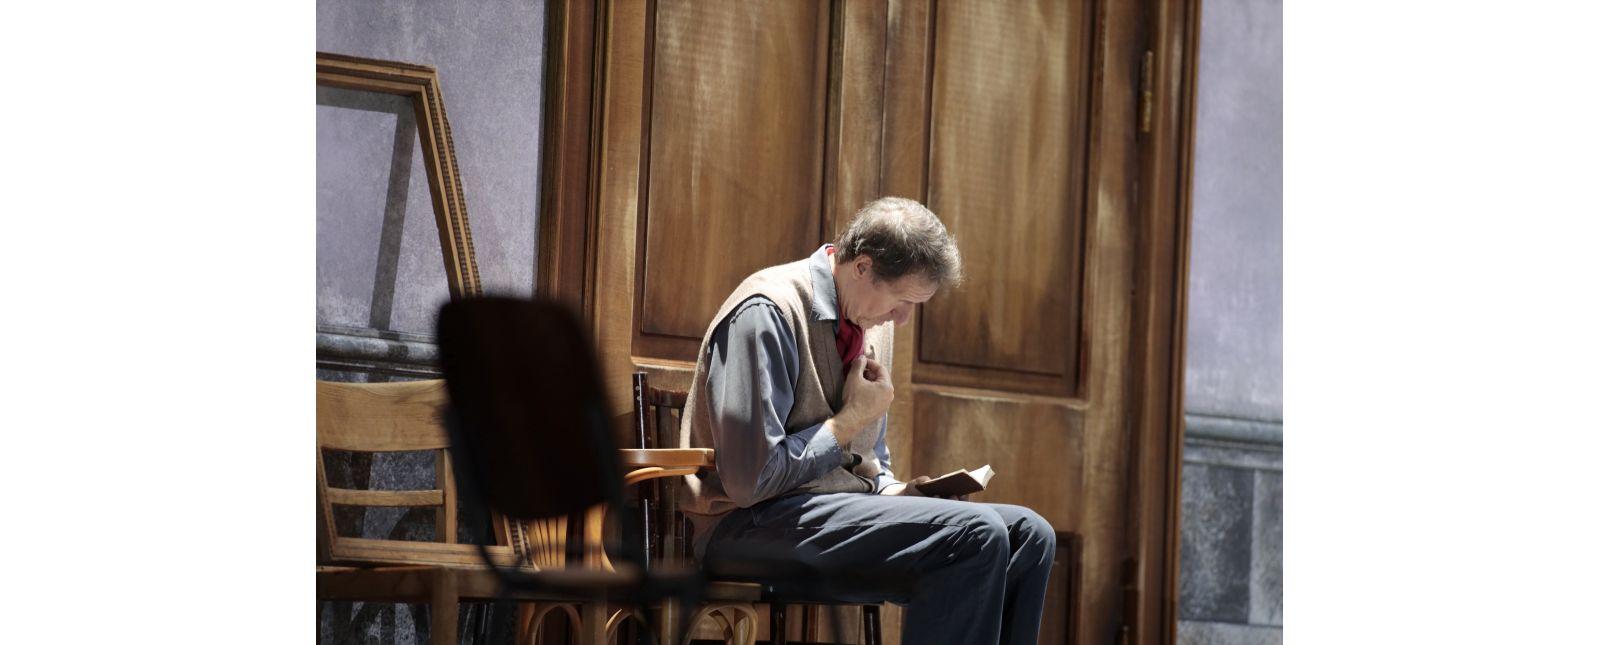 STABAT MATER // Antonio Denscheilmann // 2020 // Paul Leclaire